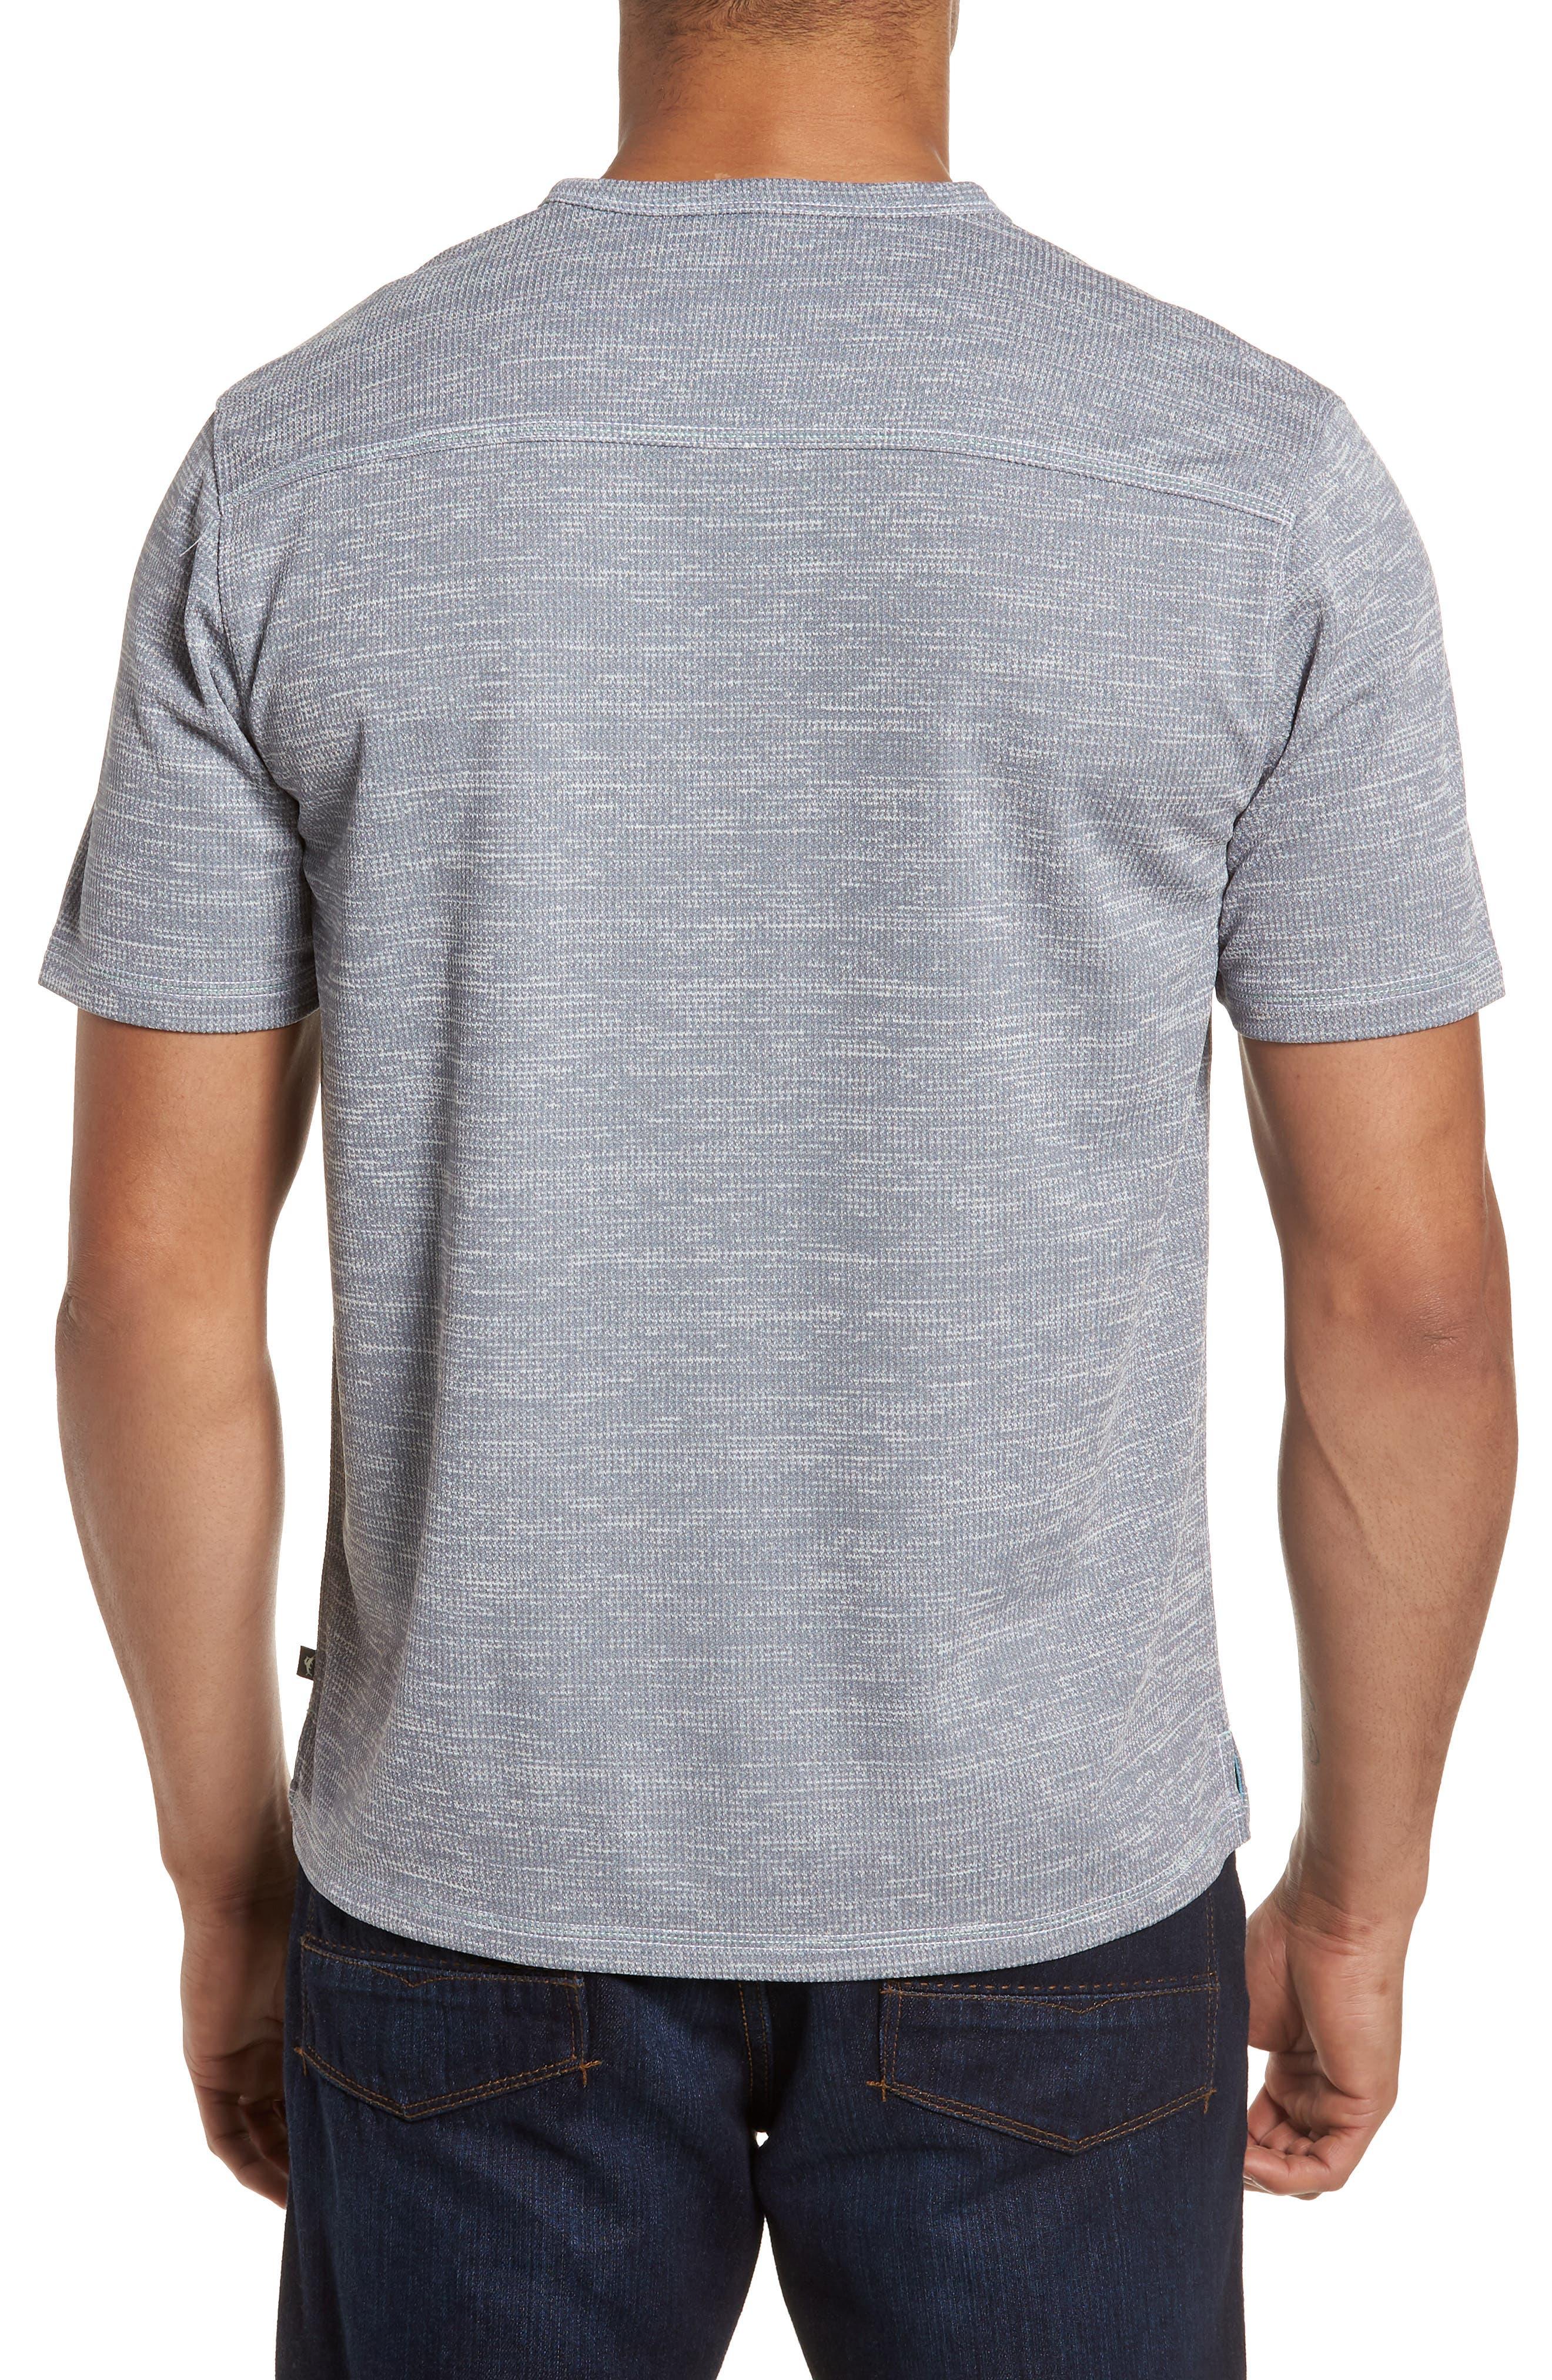 Sand Key V-Neck T-Shirt,                             Alternate thumbnail 3, color,                             Carbon Grey